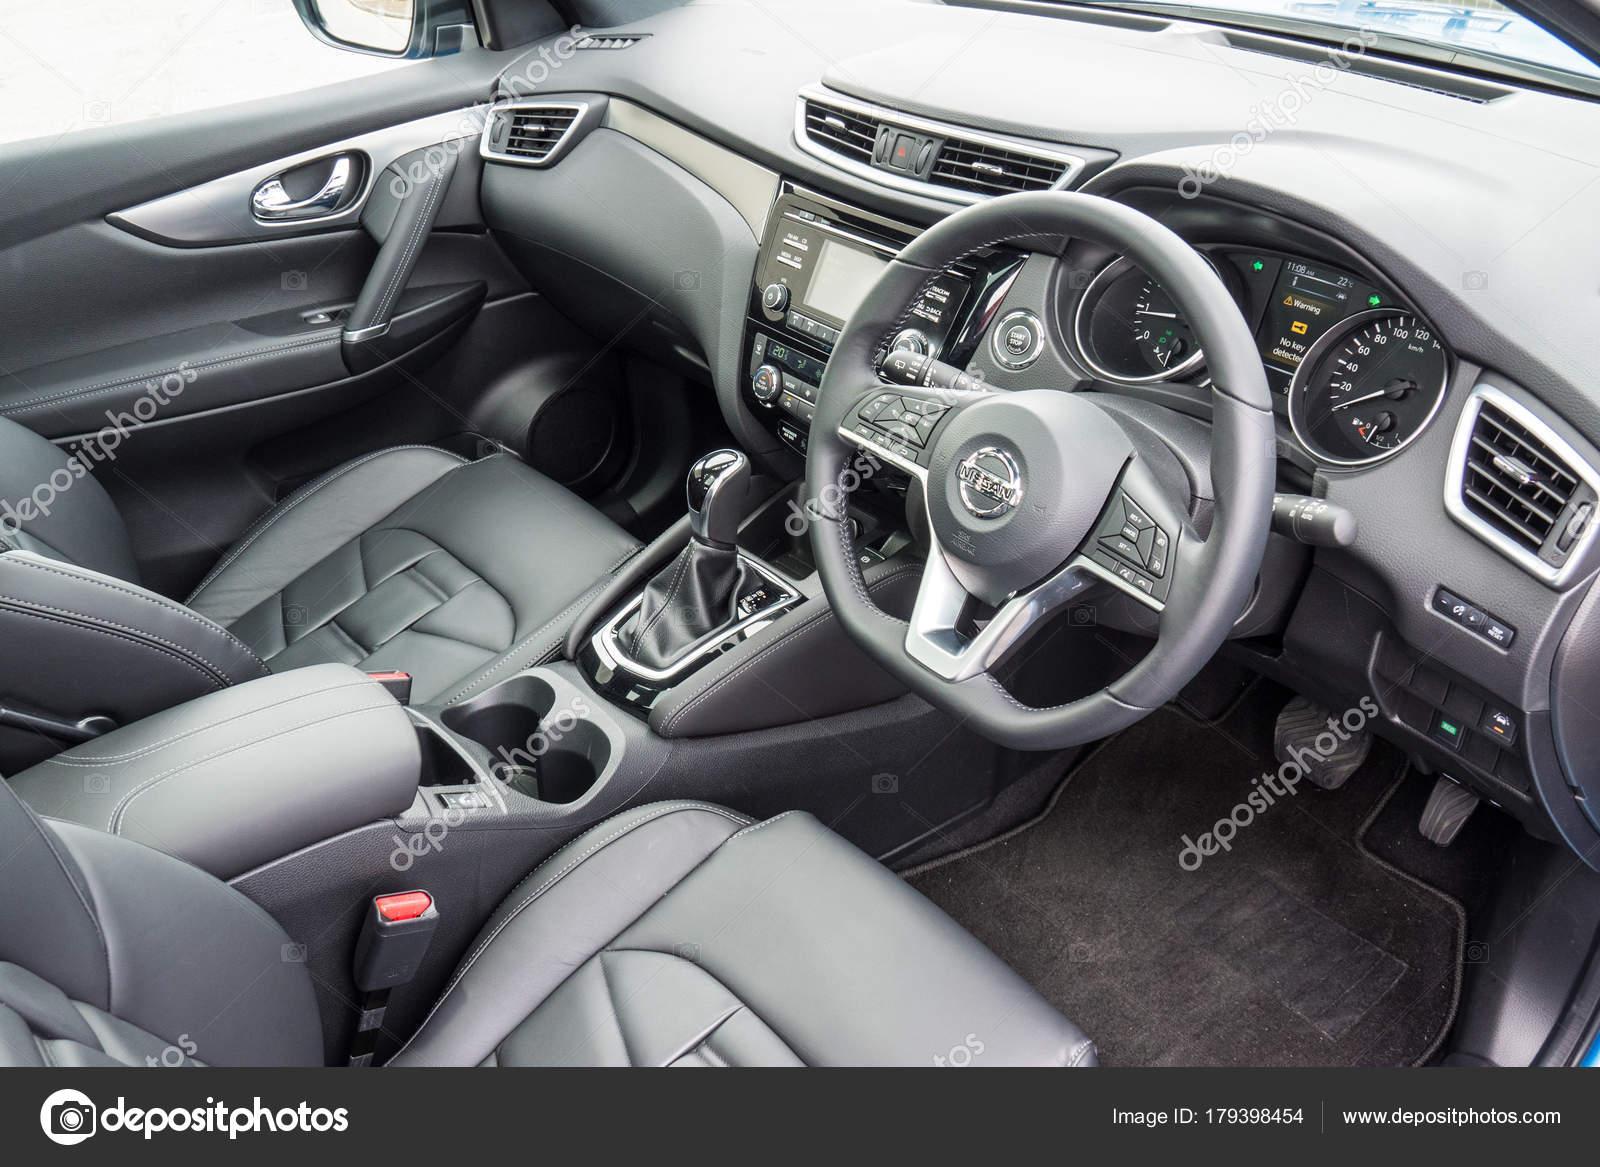 Nissan Qashqai 2017 Interior — Redaktionelles Stockfoto © teddyleung ...